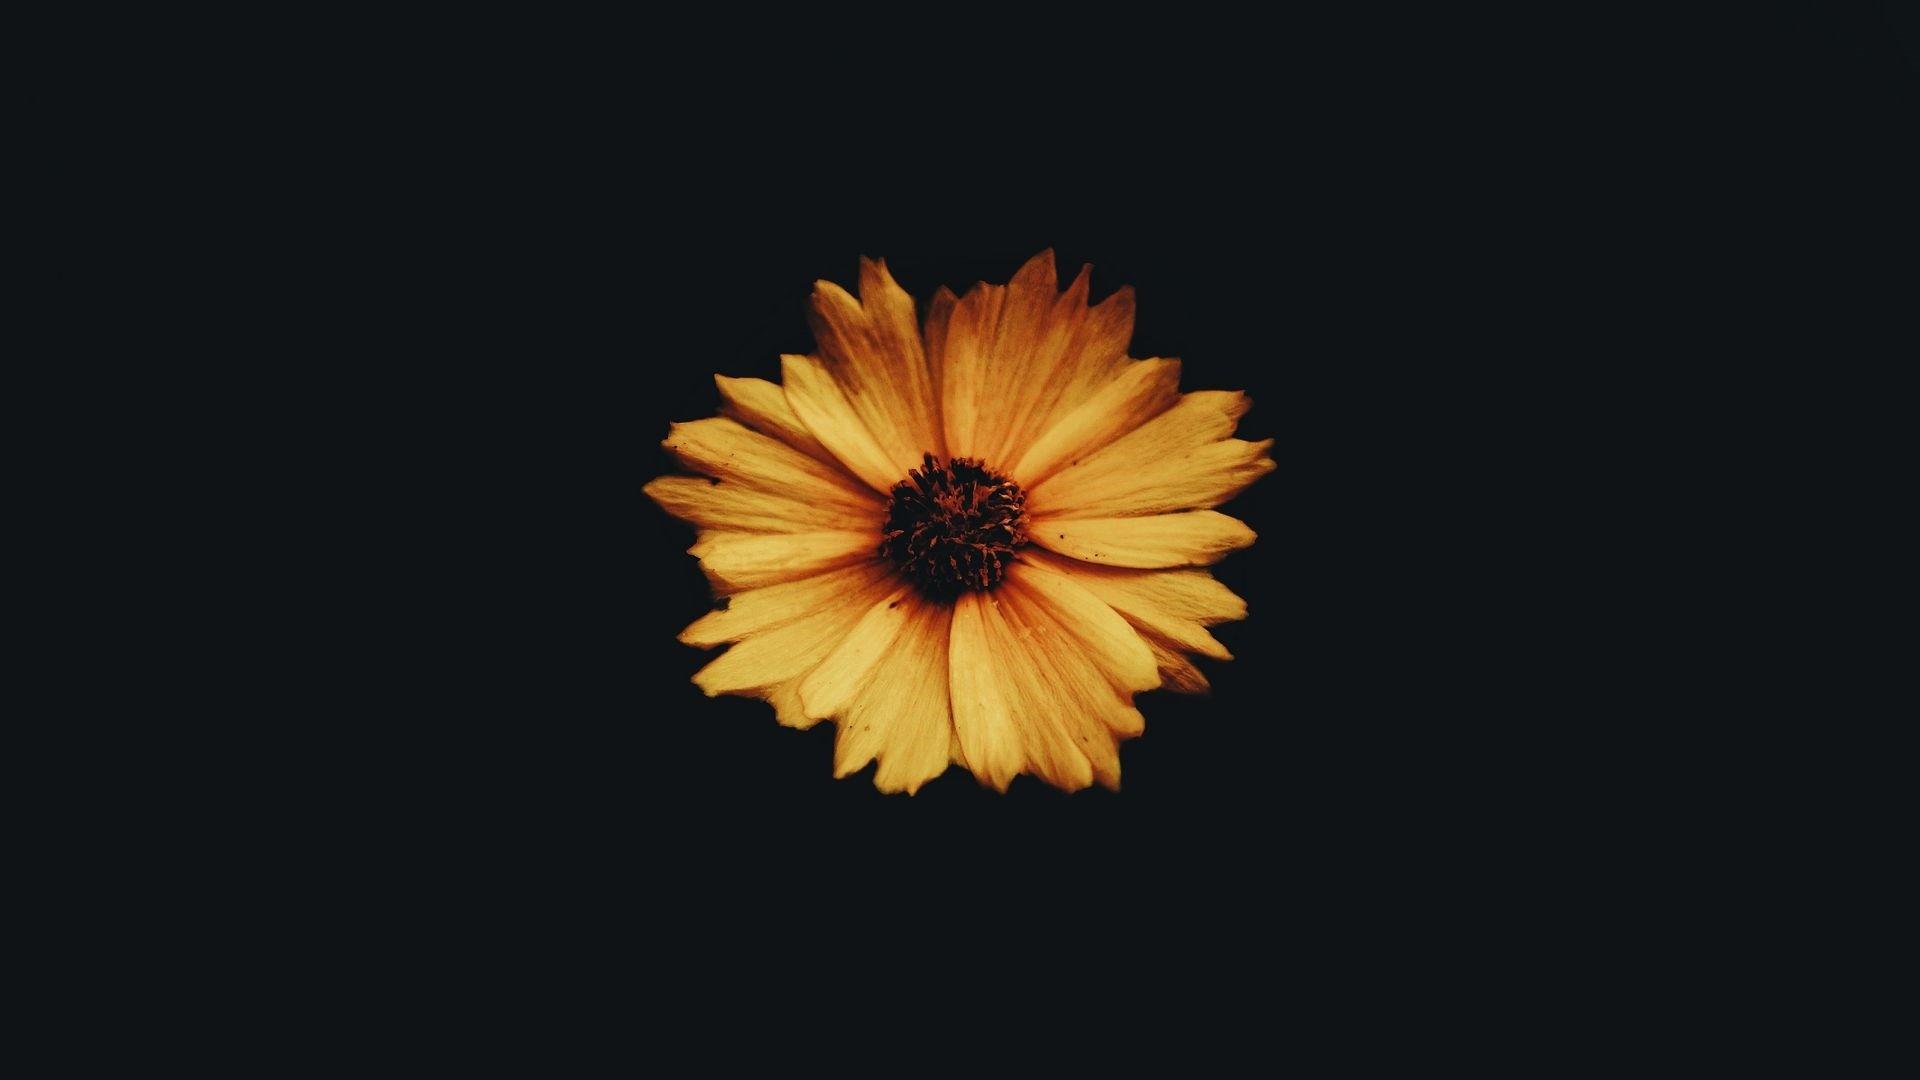 Flower Minimalist wallpaper for desktop